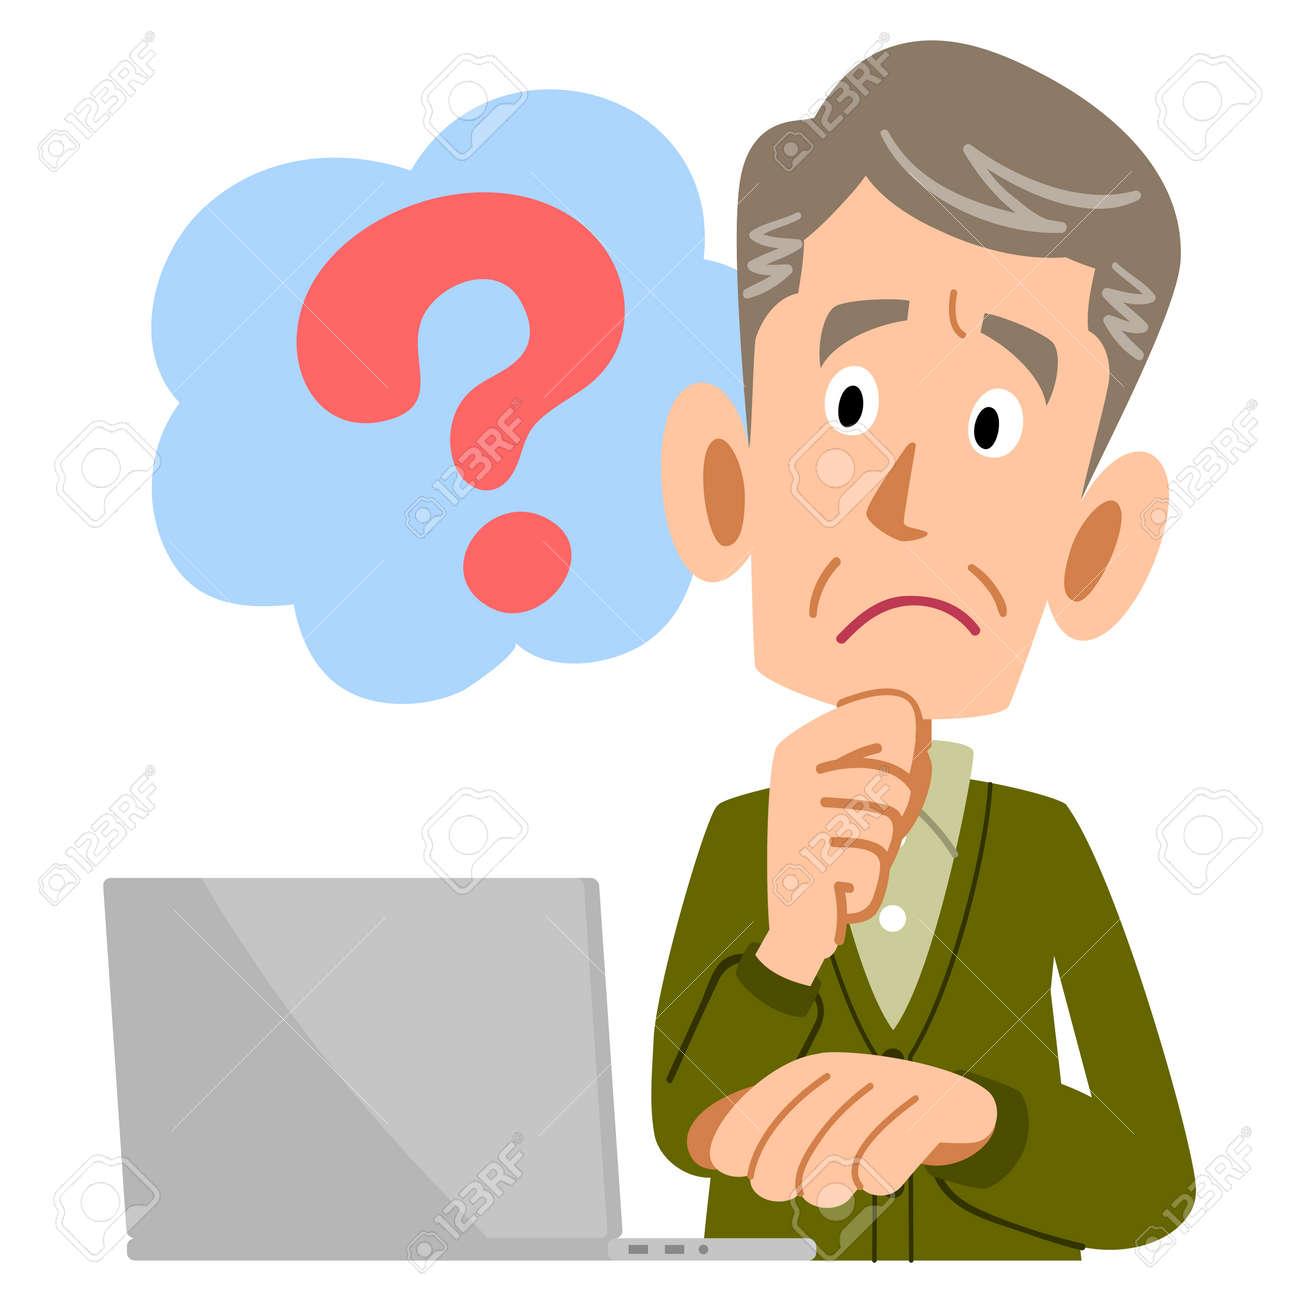 Elderly man PC questions - 56577392